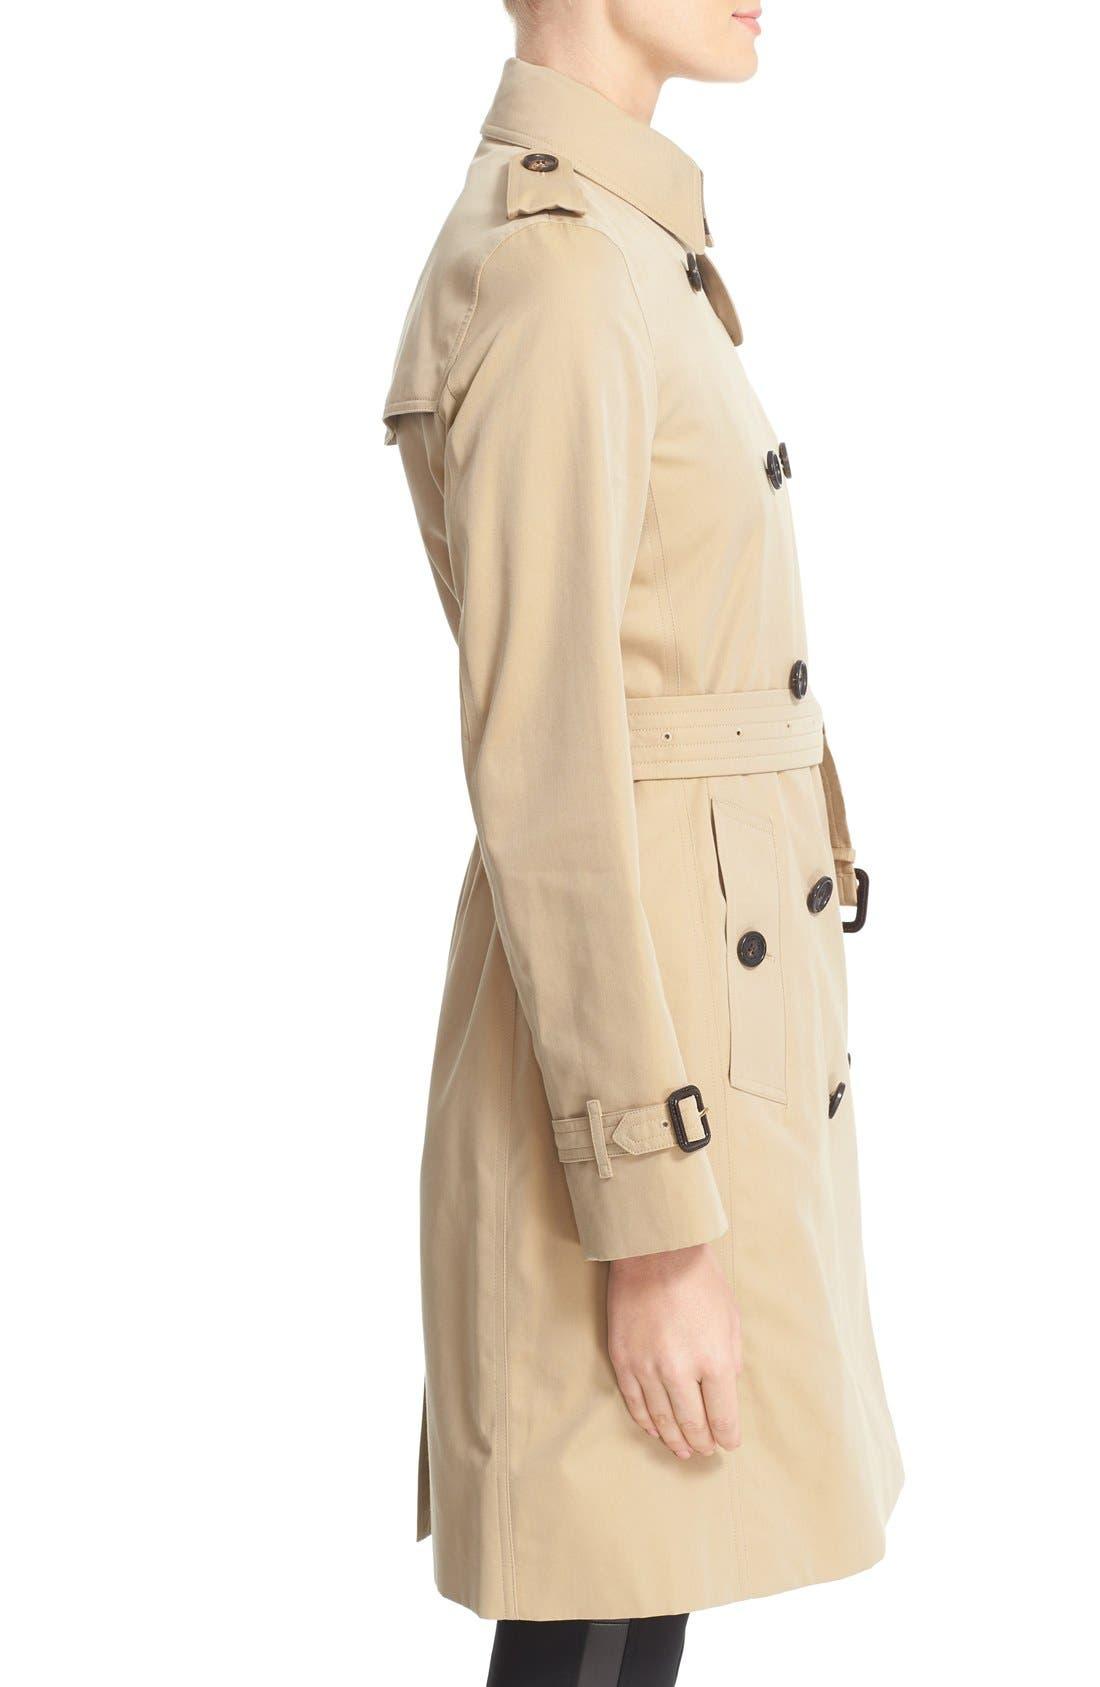 BURBERRY, Kensington Long Trench Coat, Alternate thumbnail 6, color, HONEY